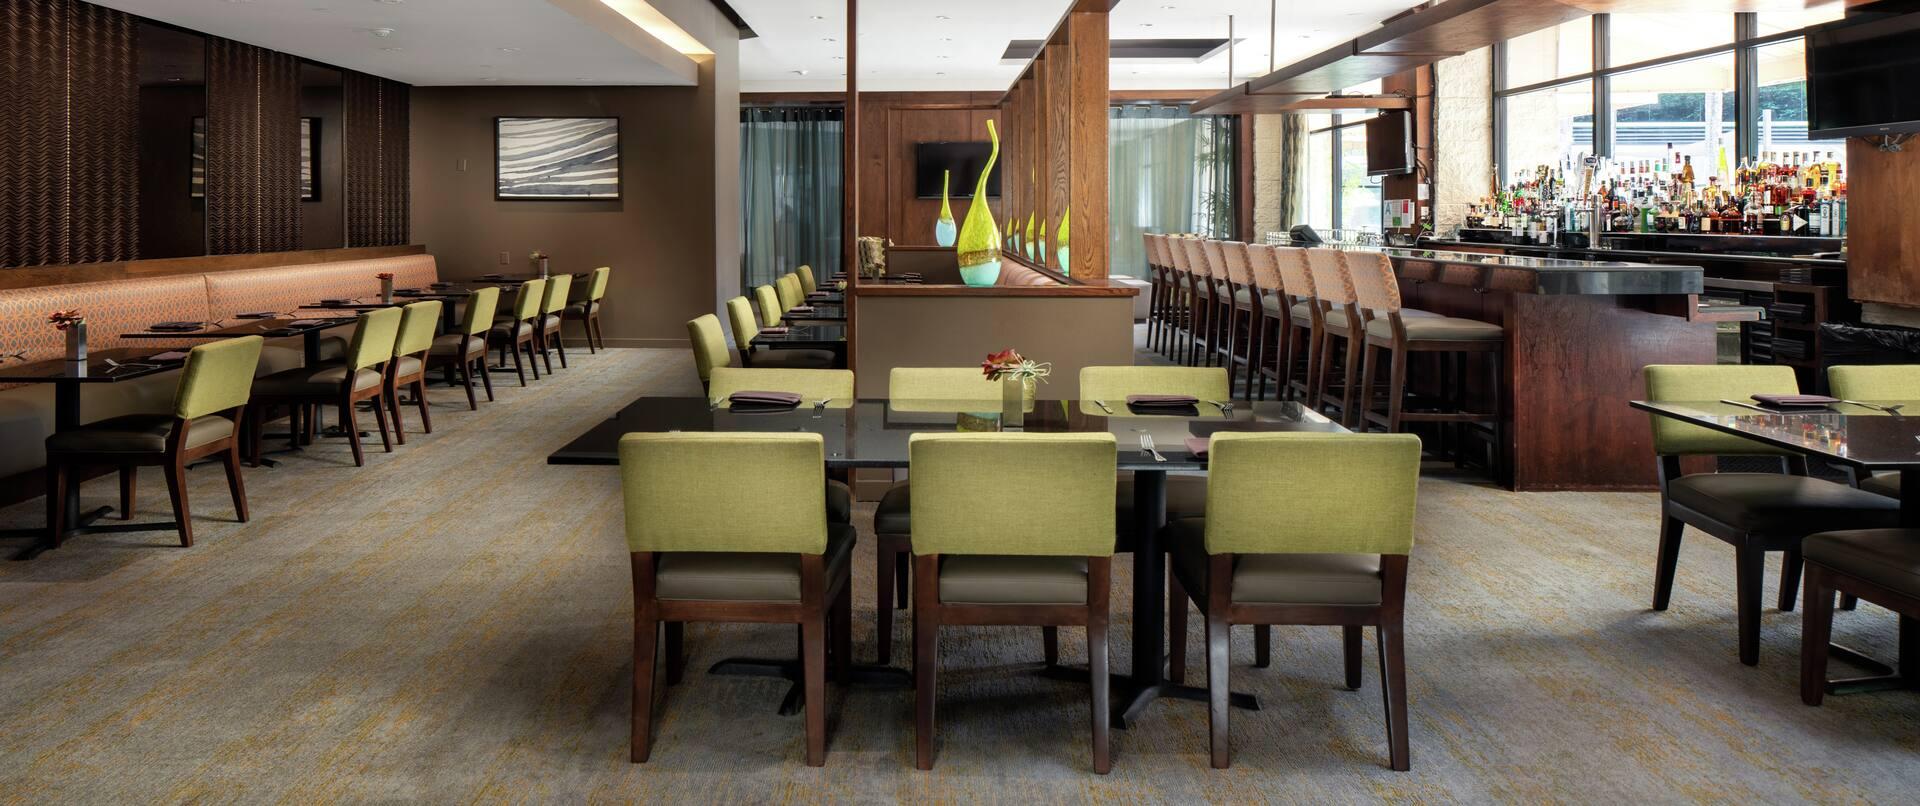 Elements Restaurant and Bar